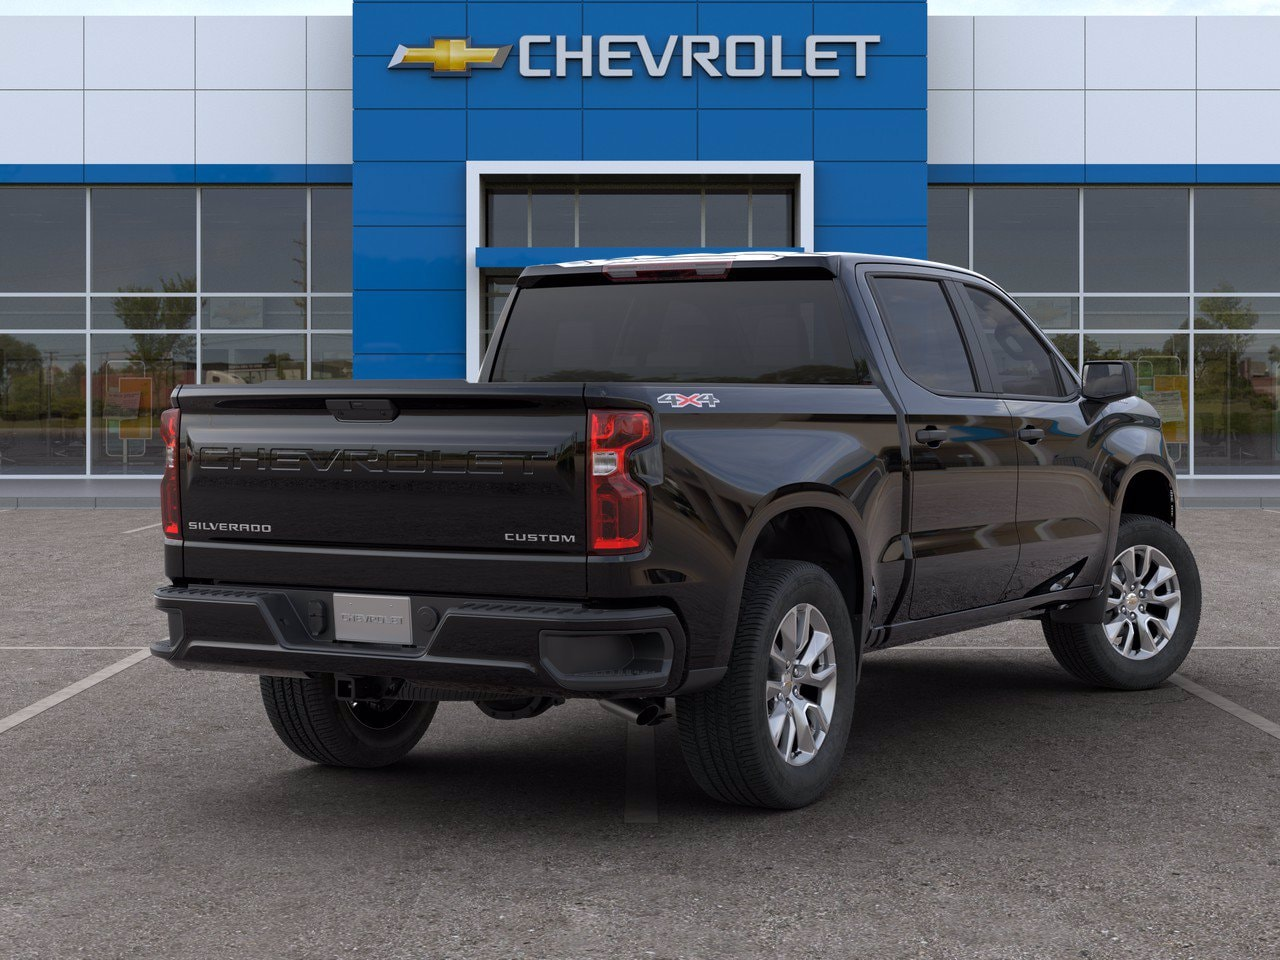 2020 Chevrolet Silverado 1500 Crew Cab 4x4, Pickup #C201392 - photo 2